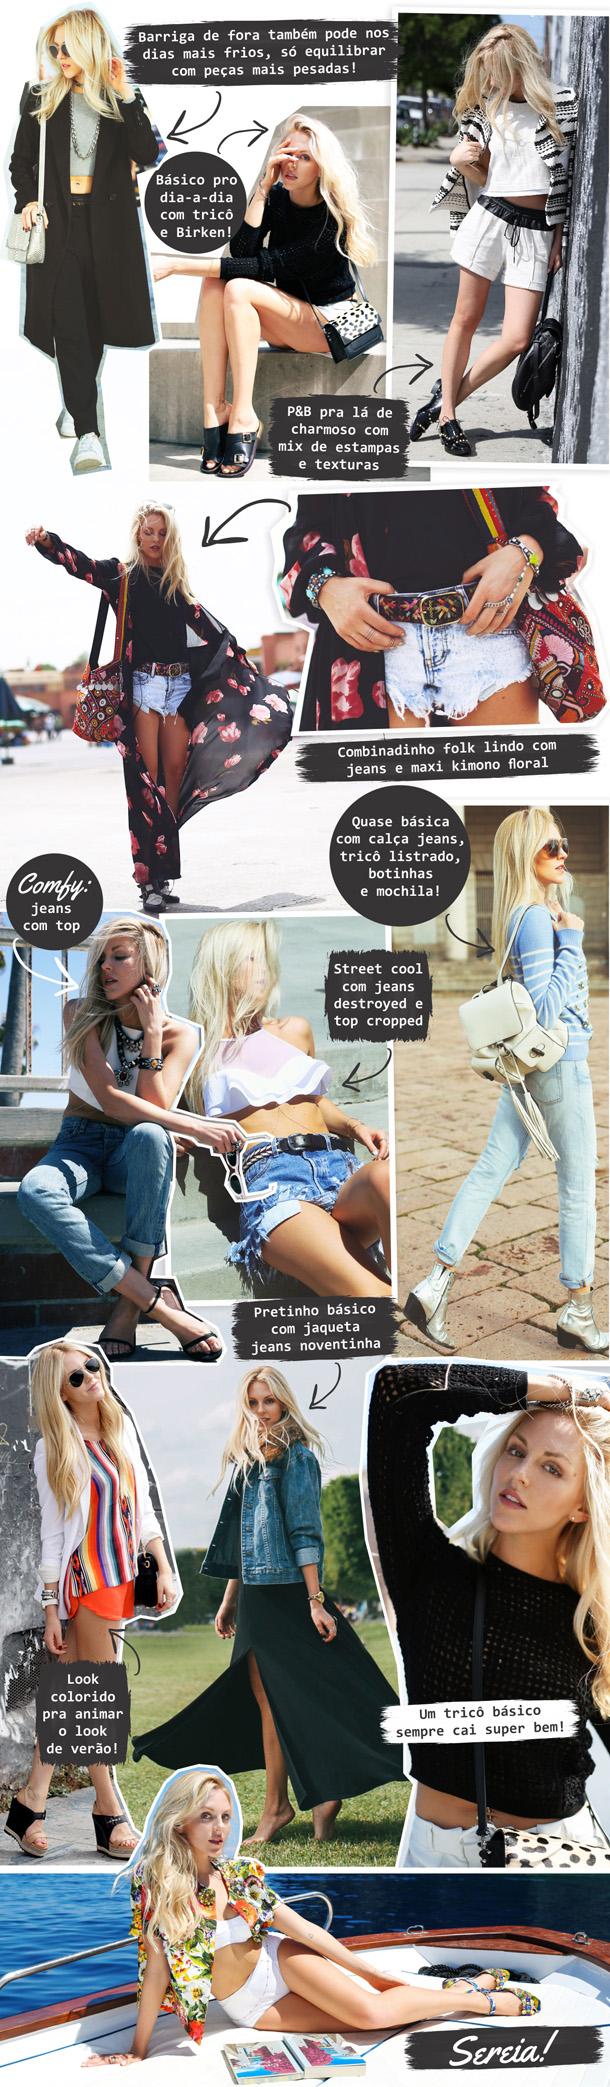 mundo-lolita-lifestyle-shea-marie-looks